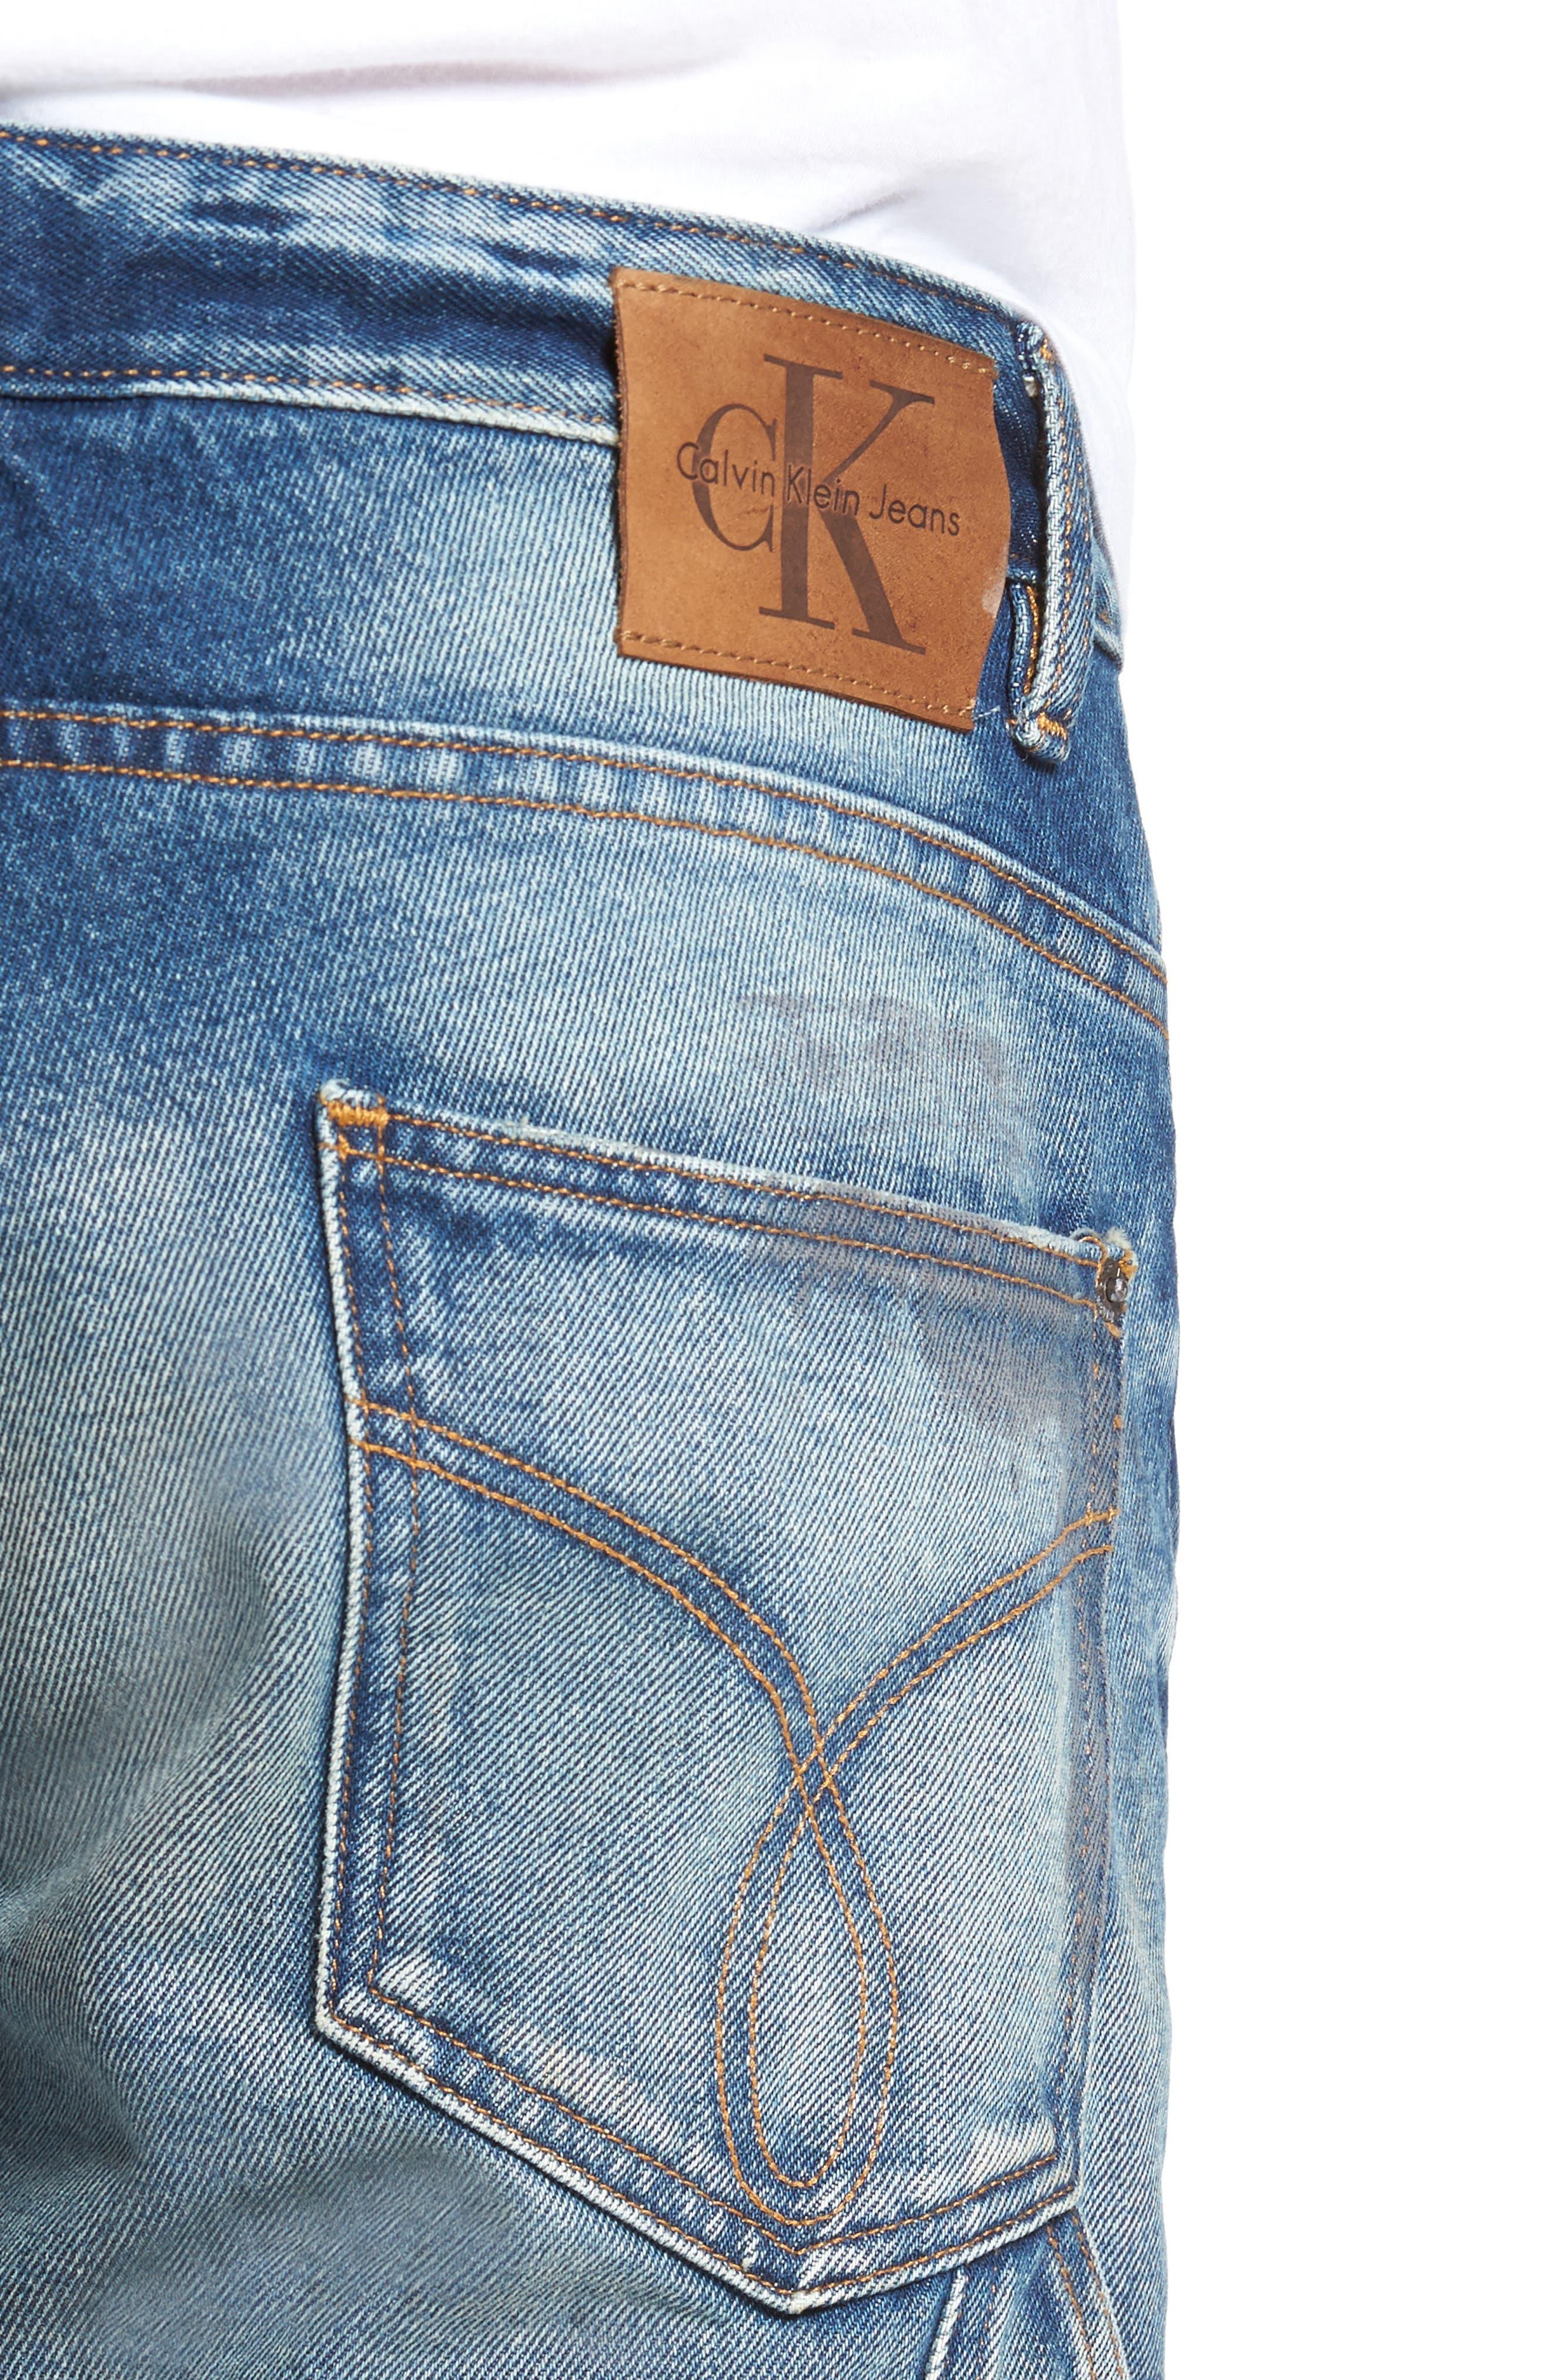 Carpenter Slim Fit Jeans,                             Alternate thumbnail 4, color,                             492